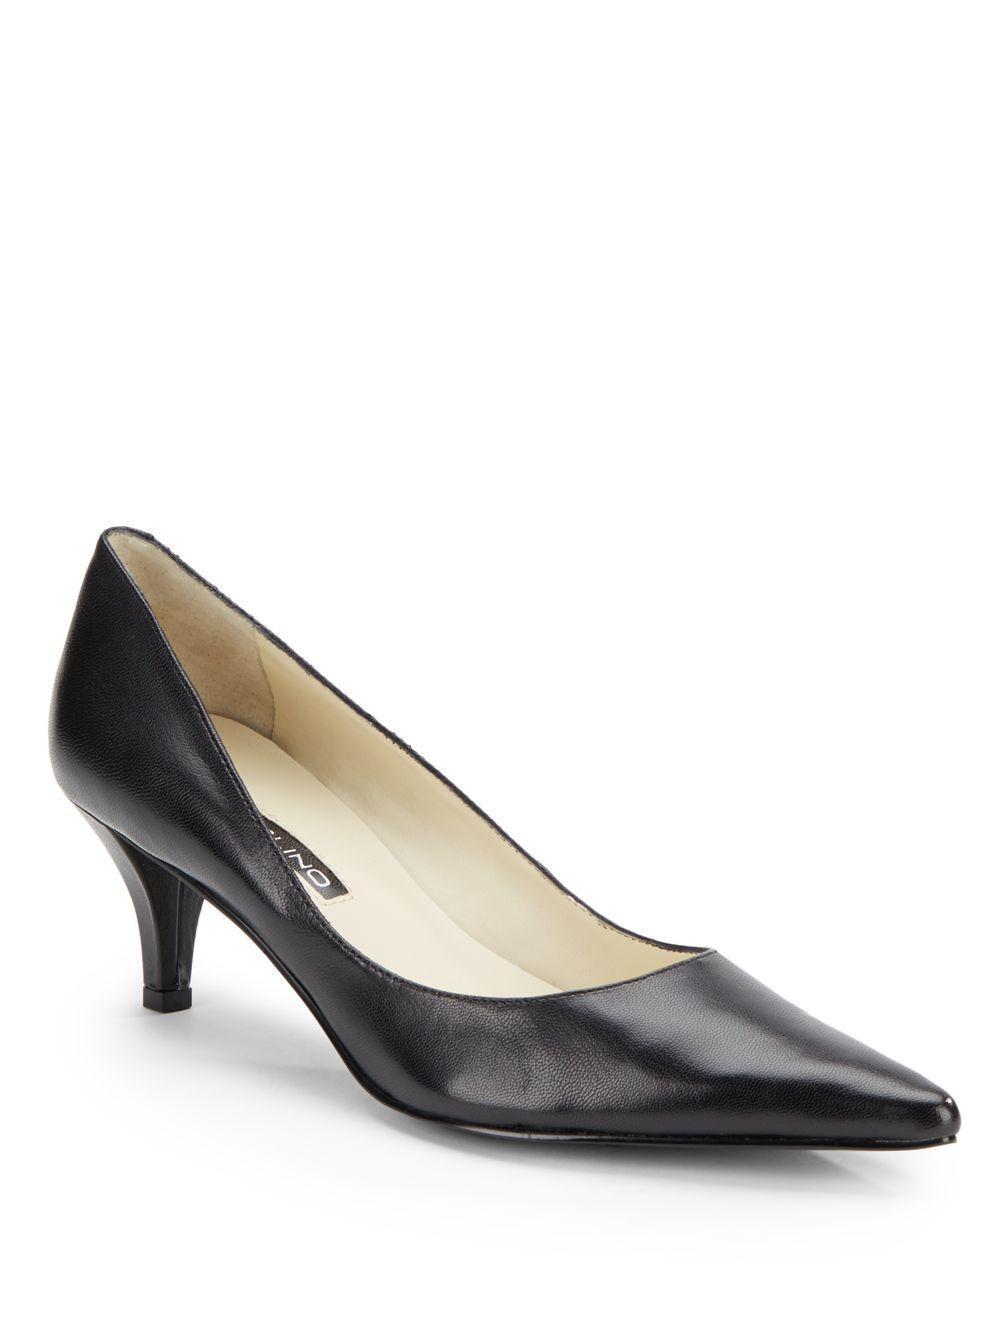 fa9b79b438 Bandolino Berry Leather Kitten-Heel Pumps in Black - Lyst